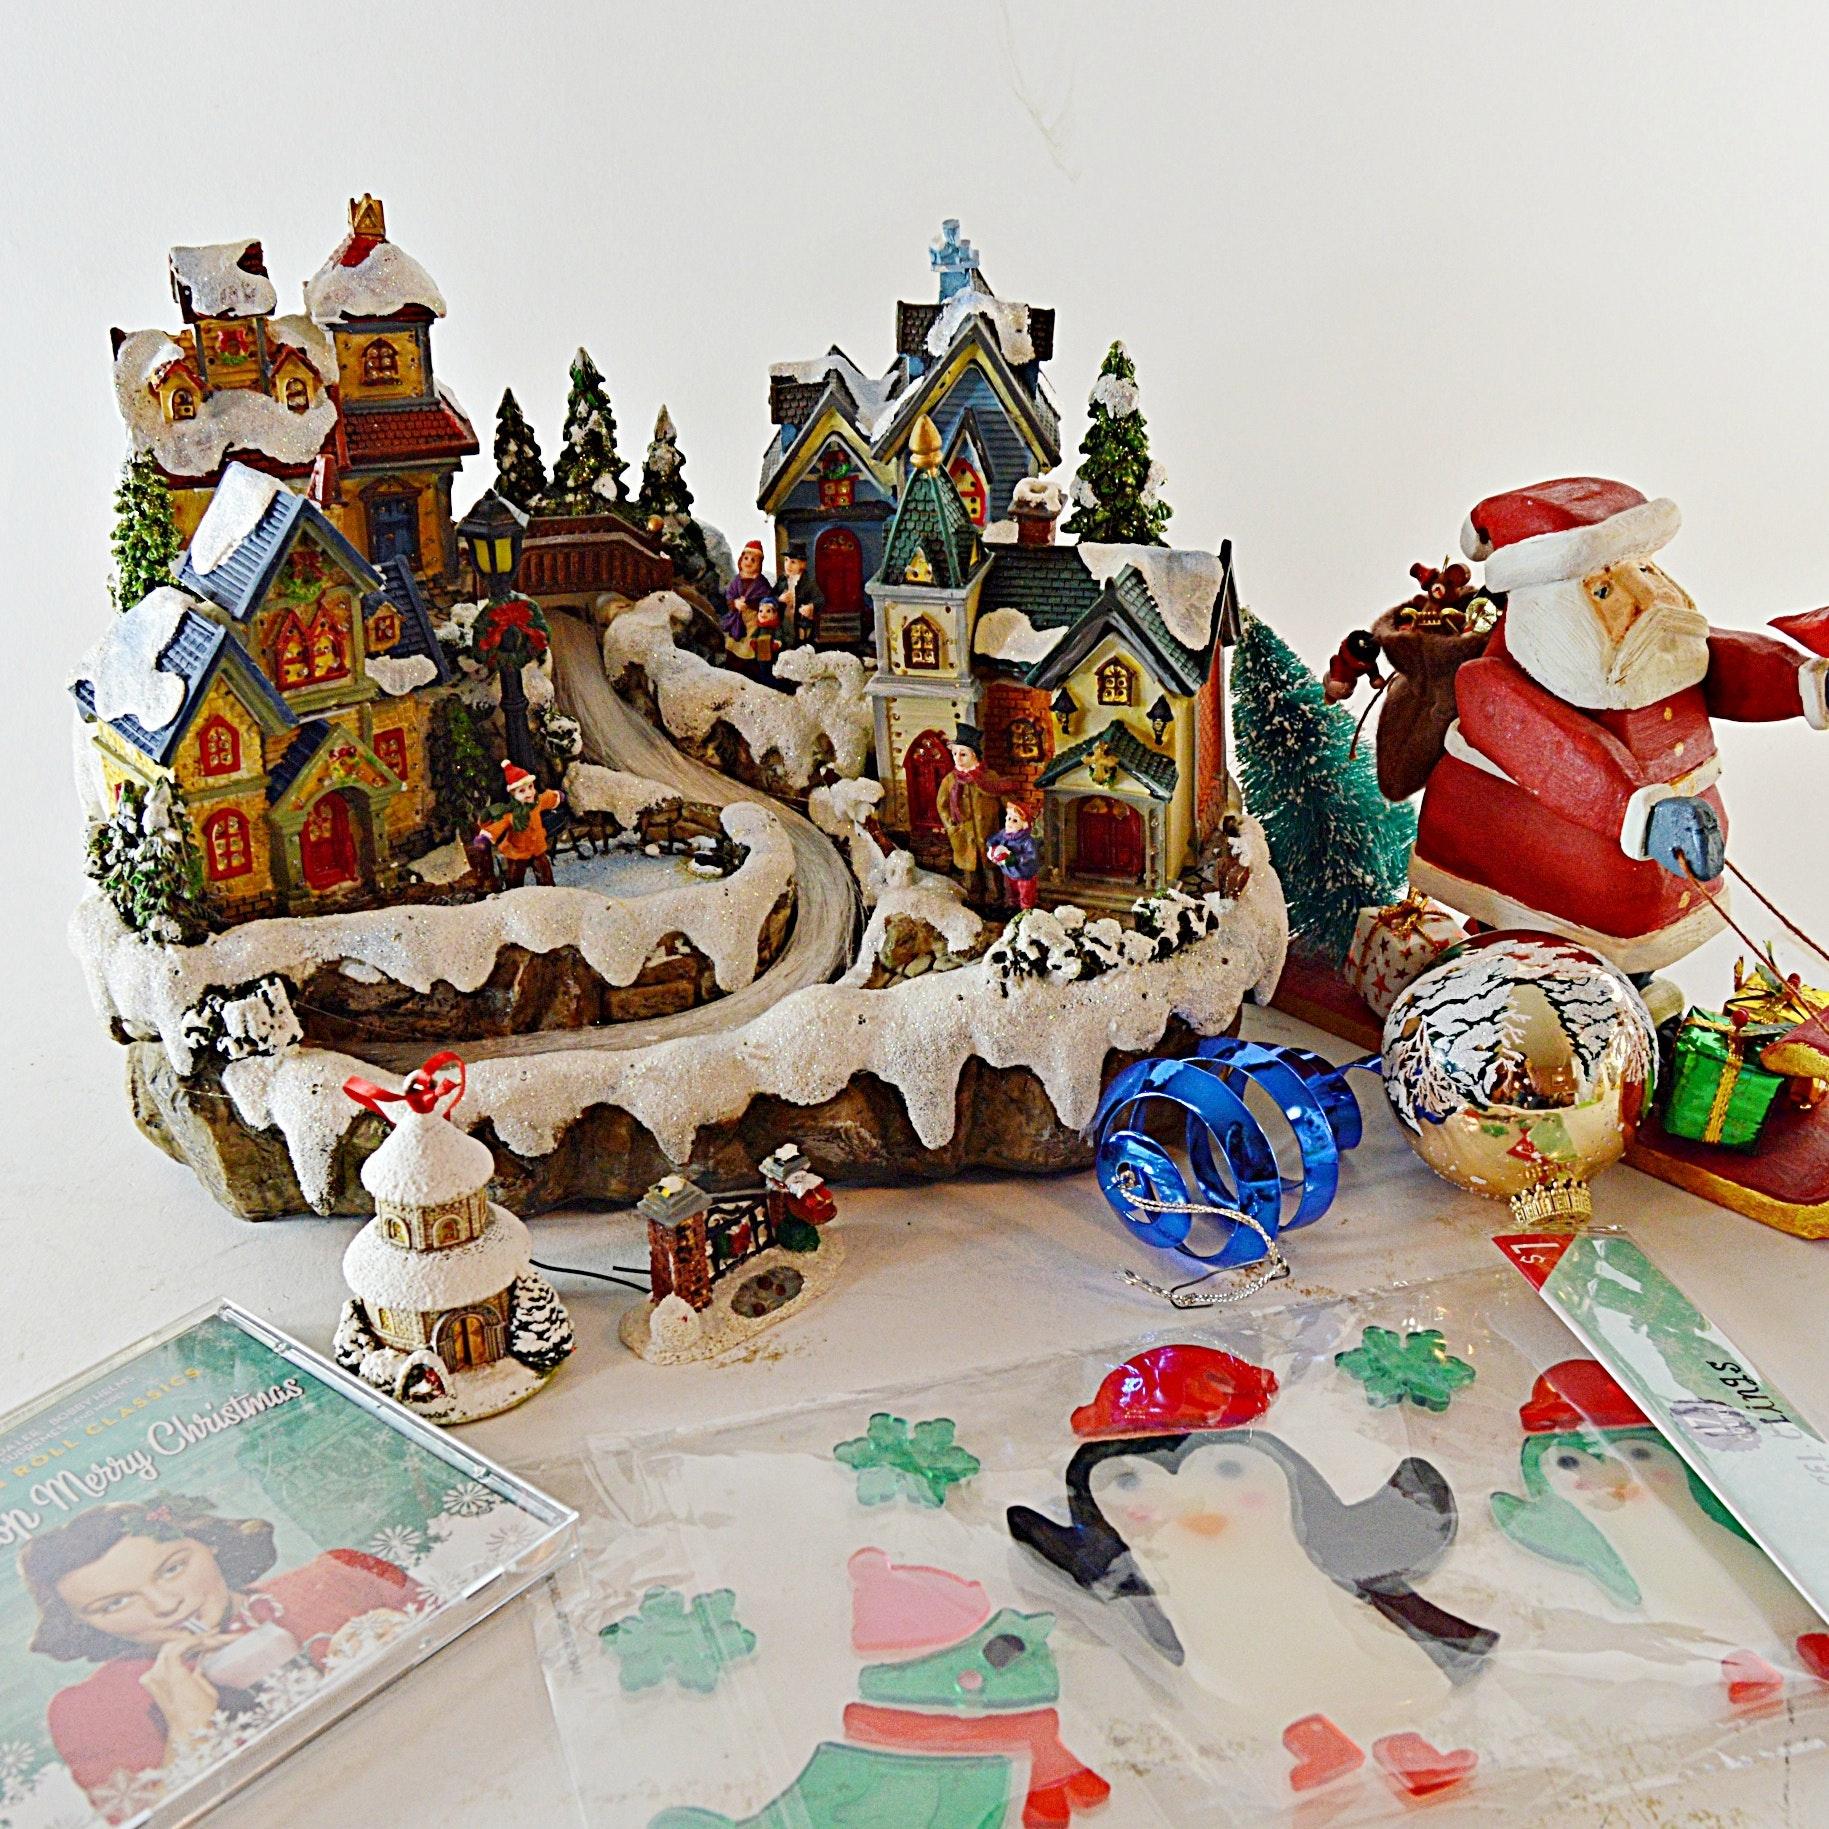 Lighted Christmas Village, Other Christmas Decor